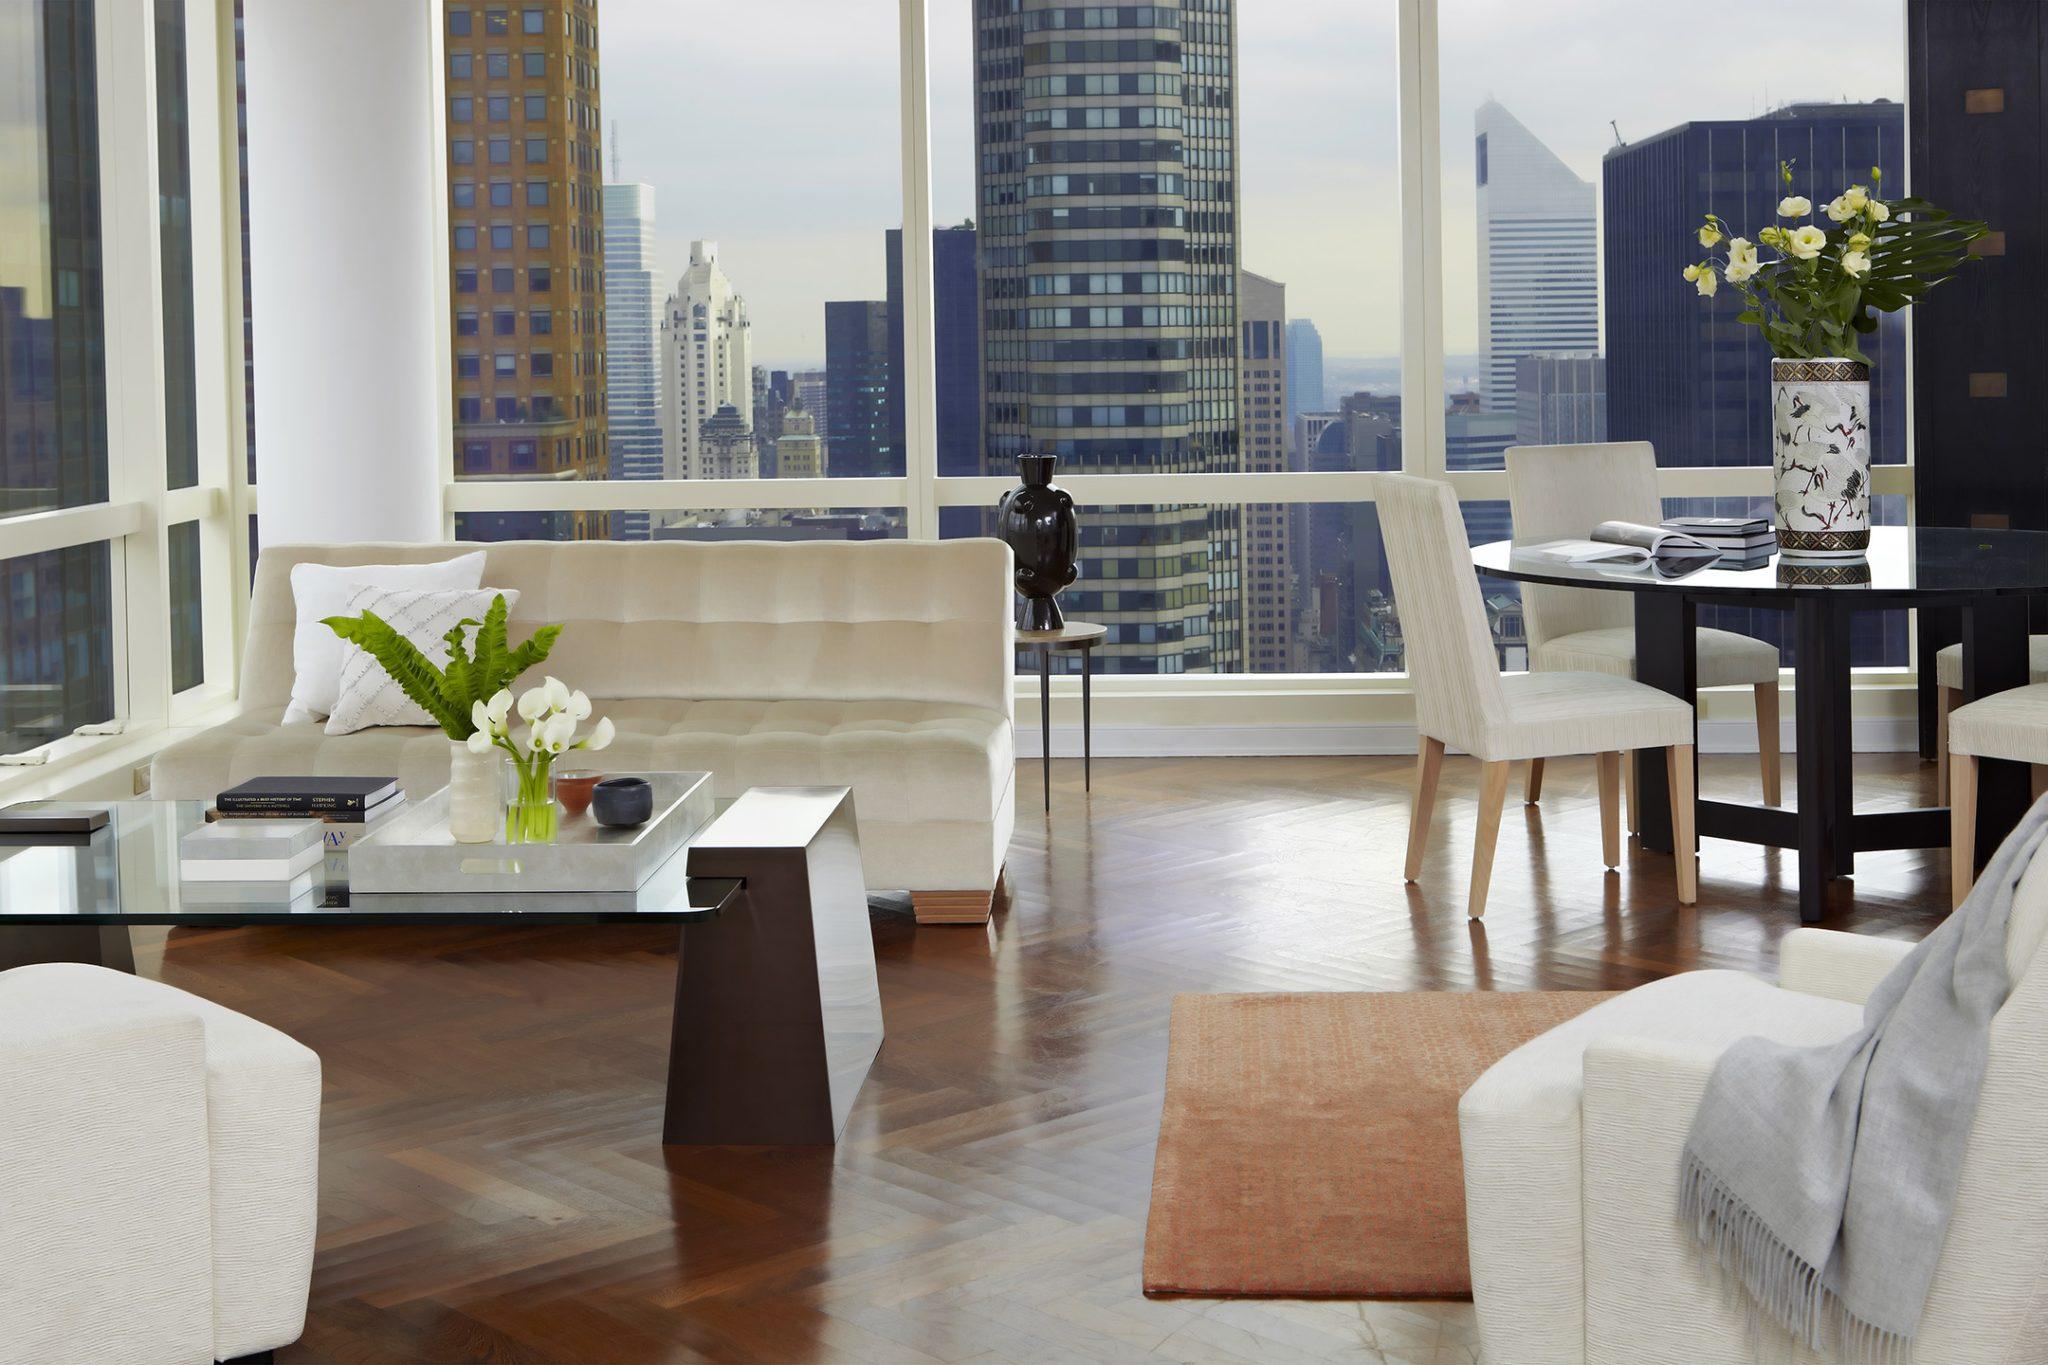 Daniel Craig apartment - living room by Jarret Yoshida